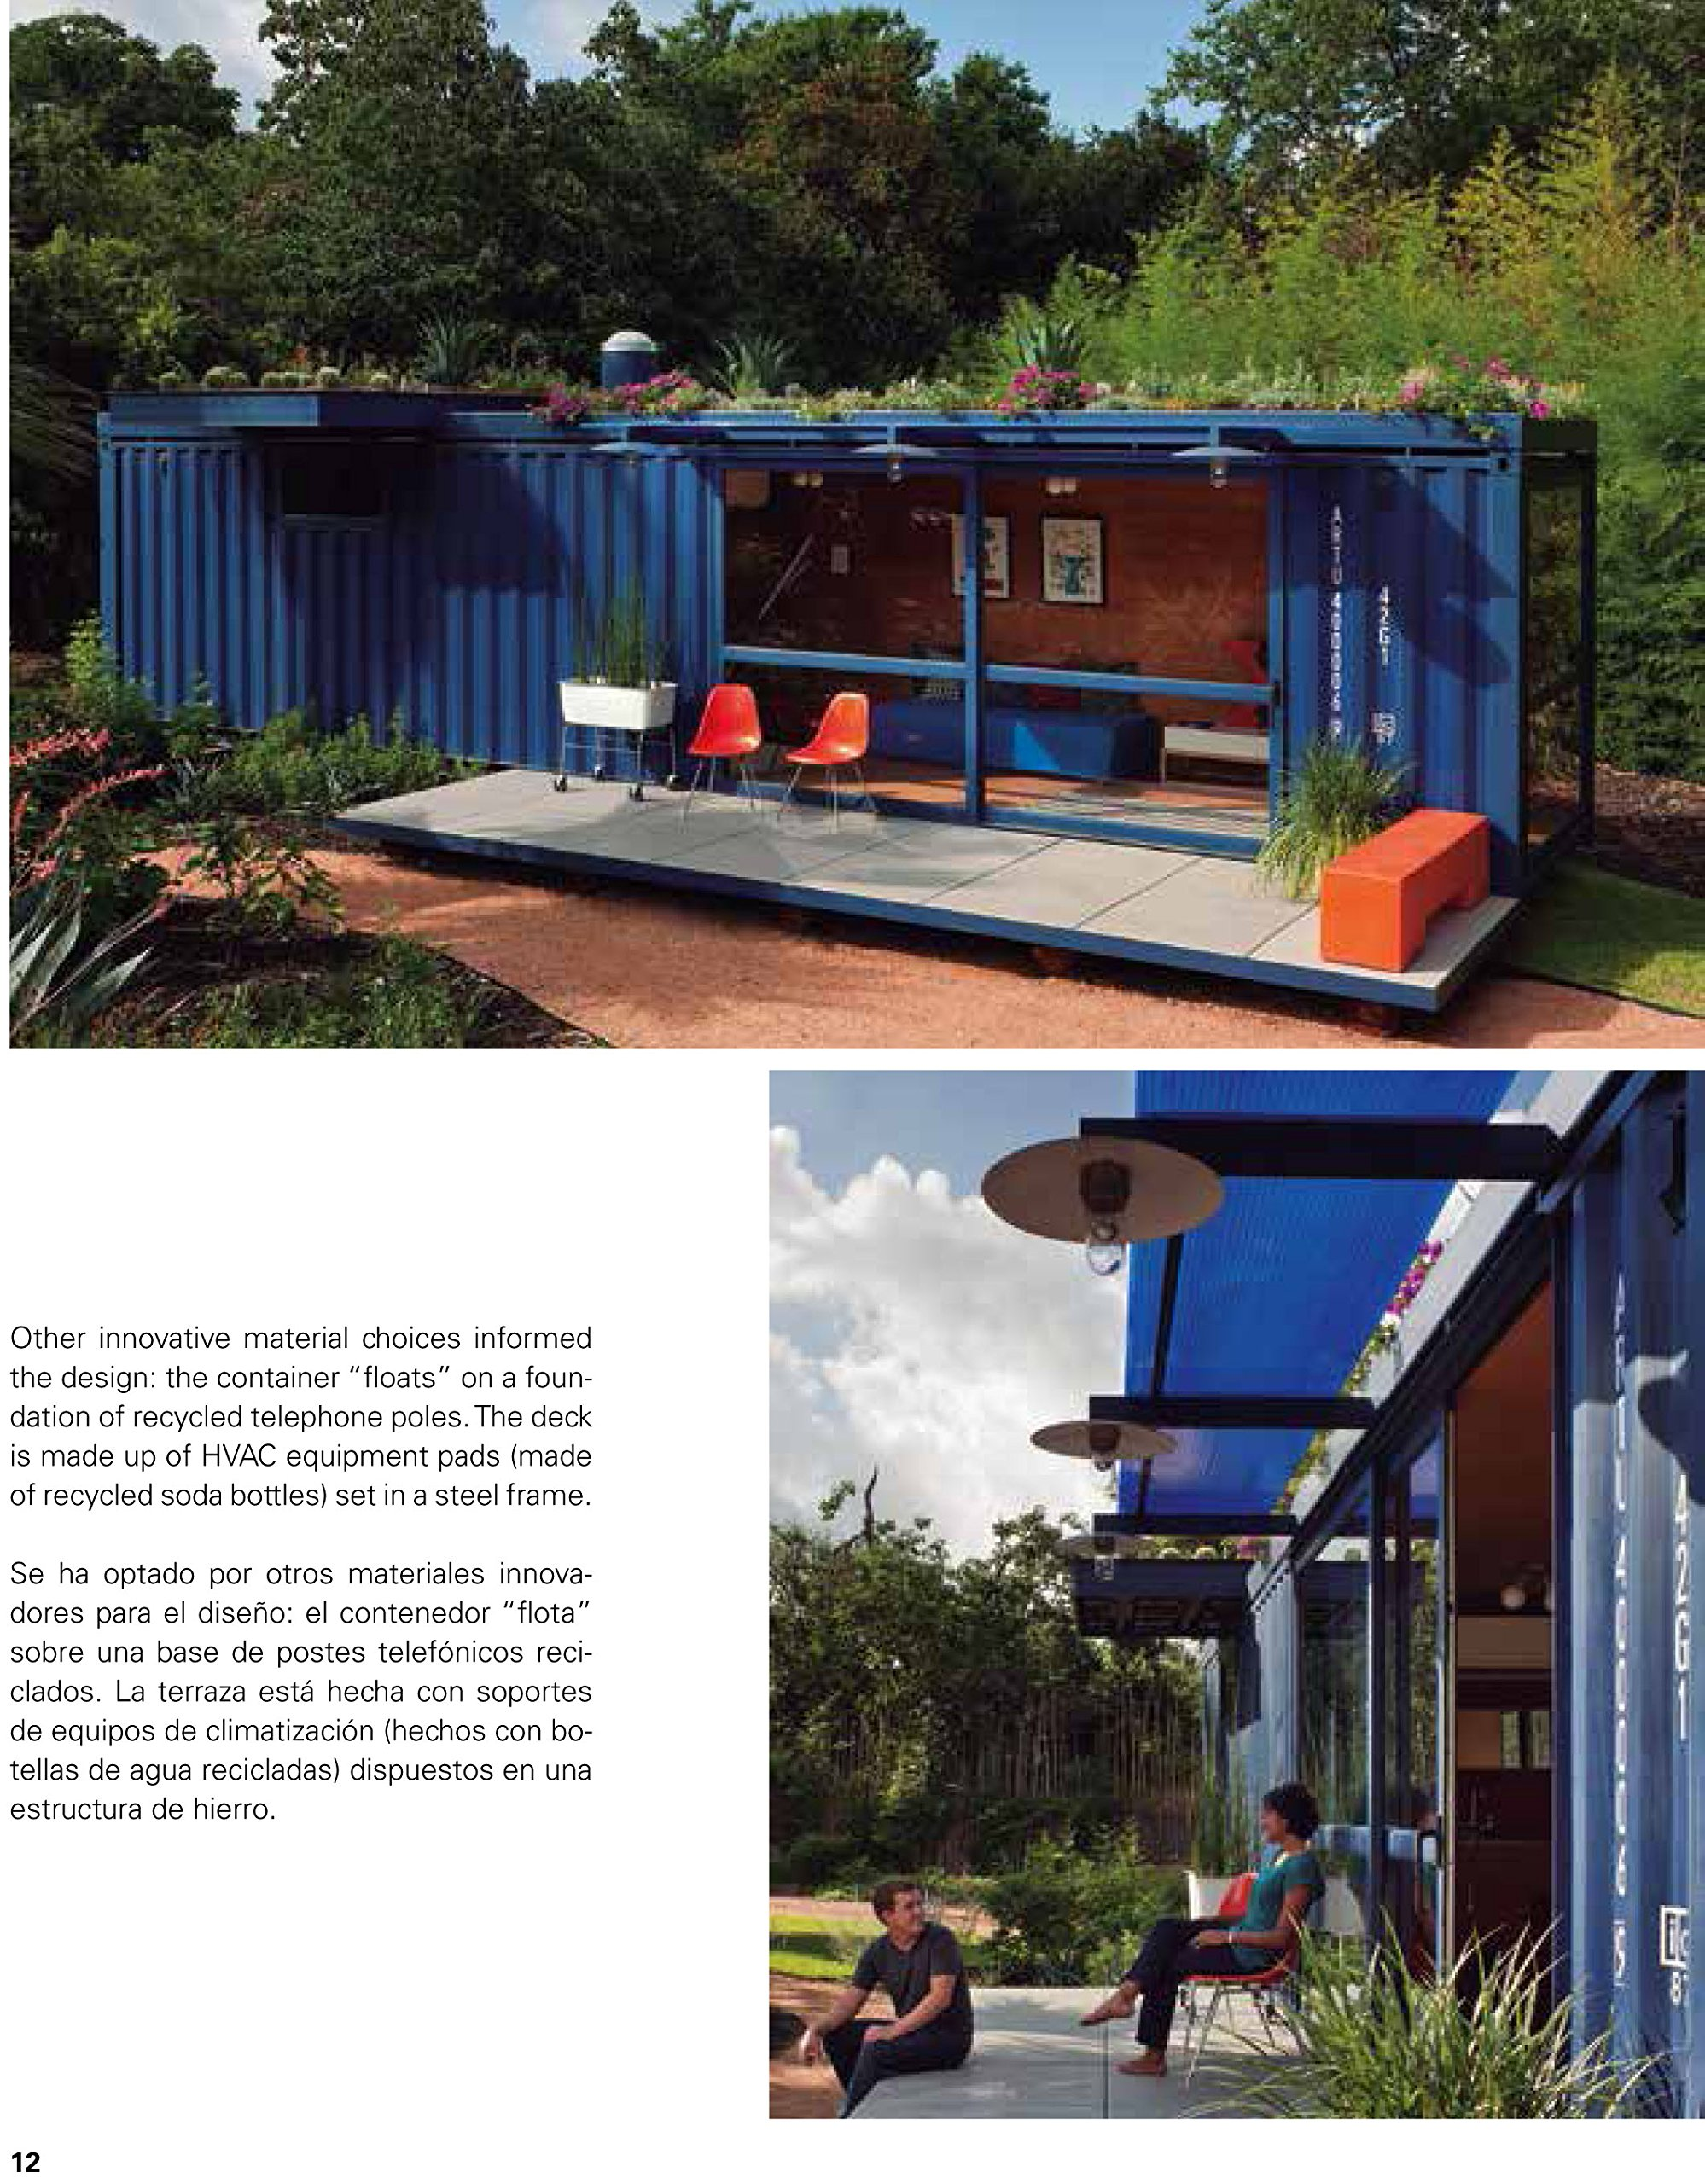 low cost architecture josep minguet patricia